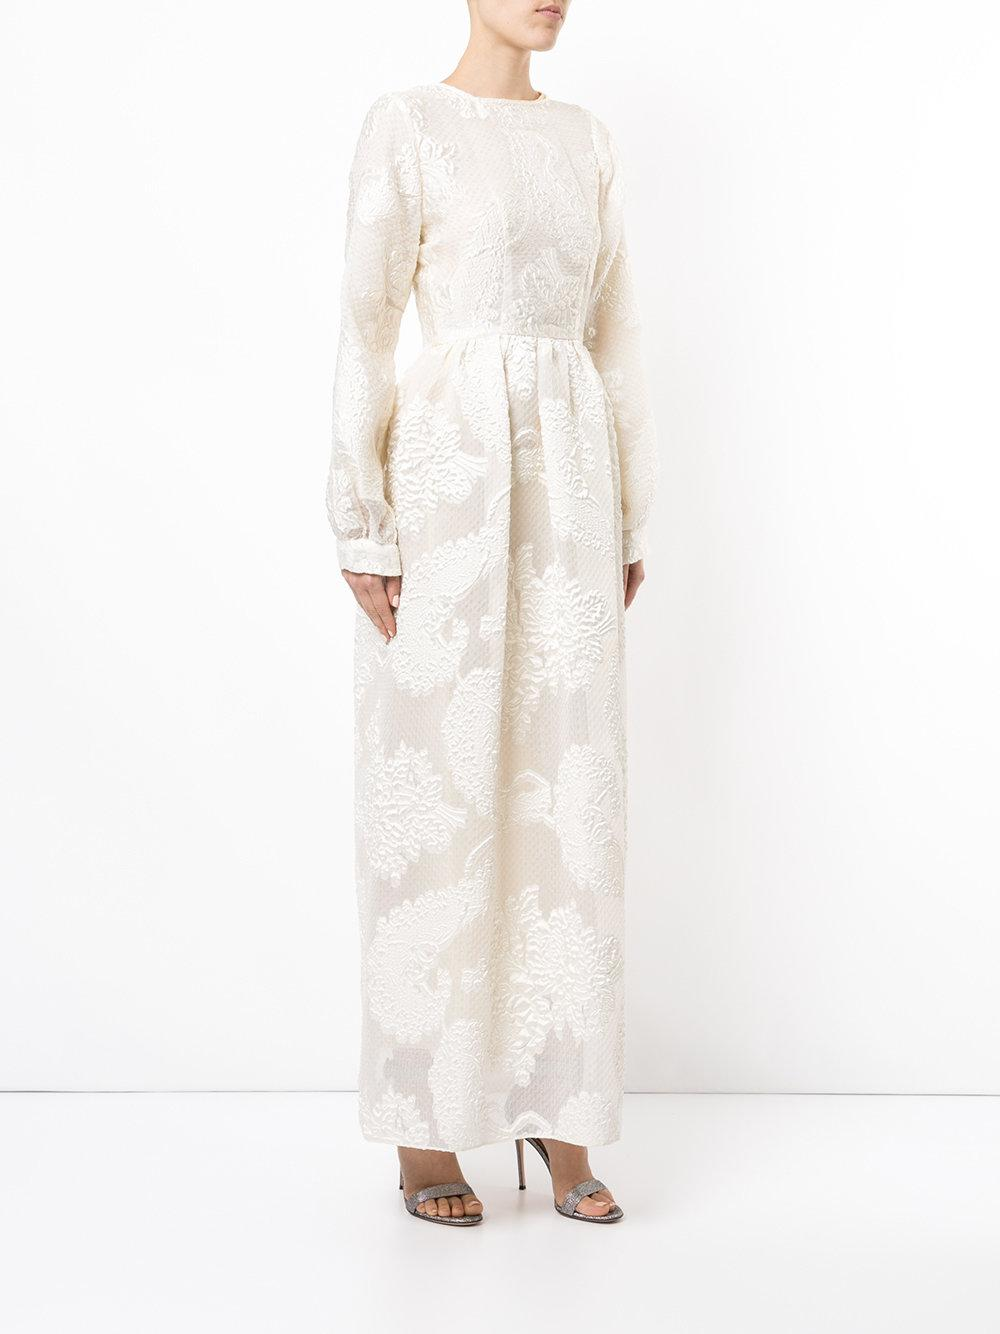 Lyst - Bambah Valentine Gown in White